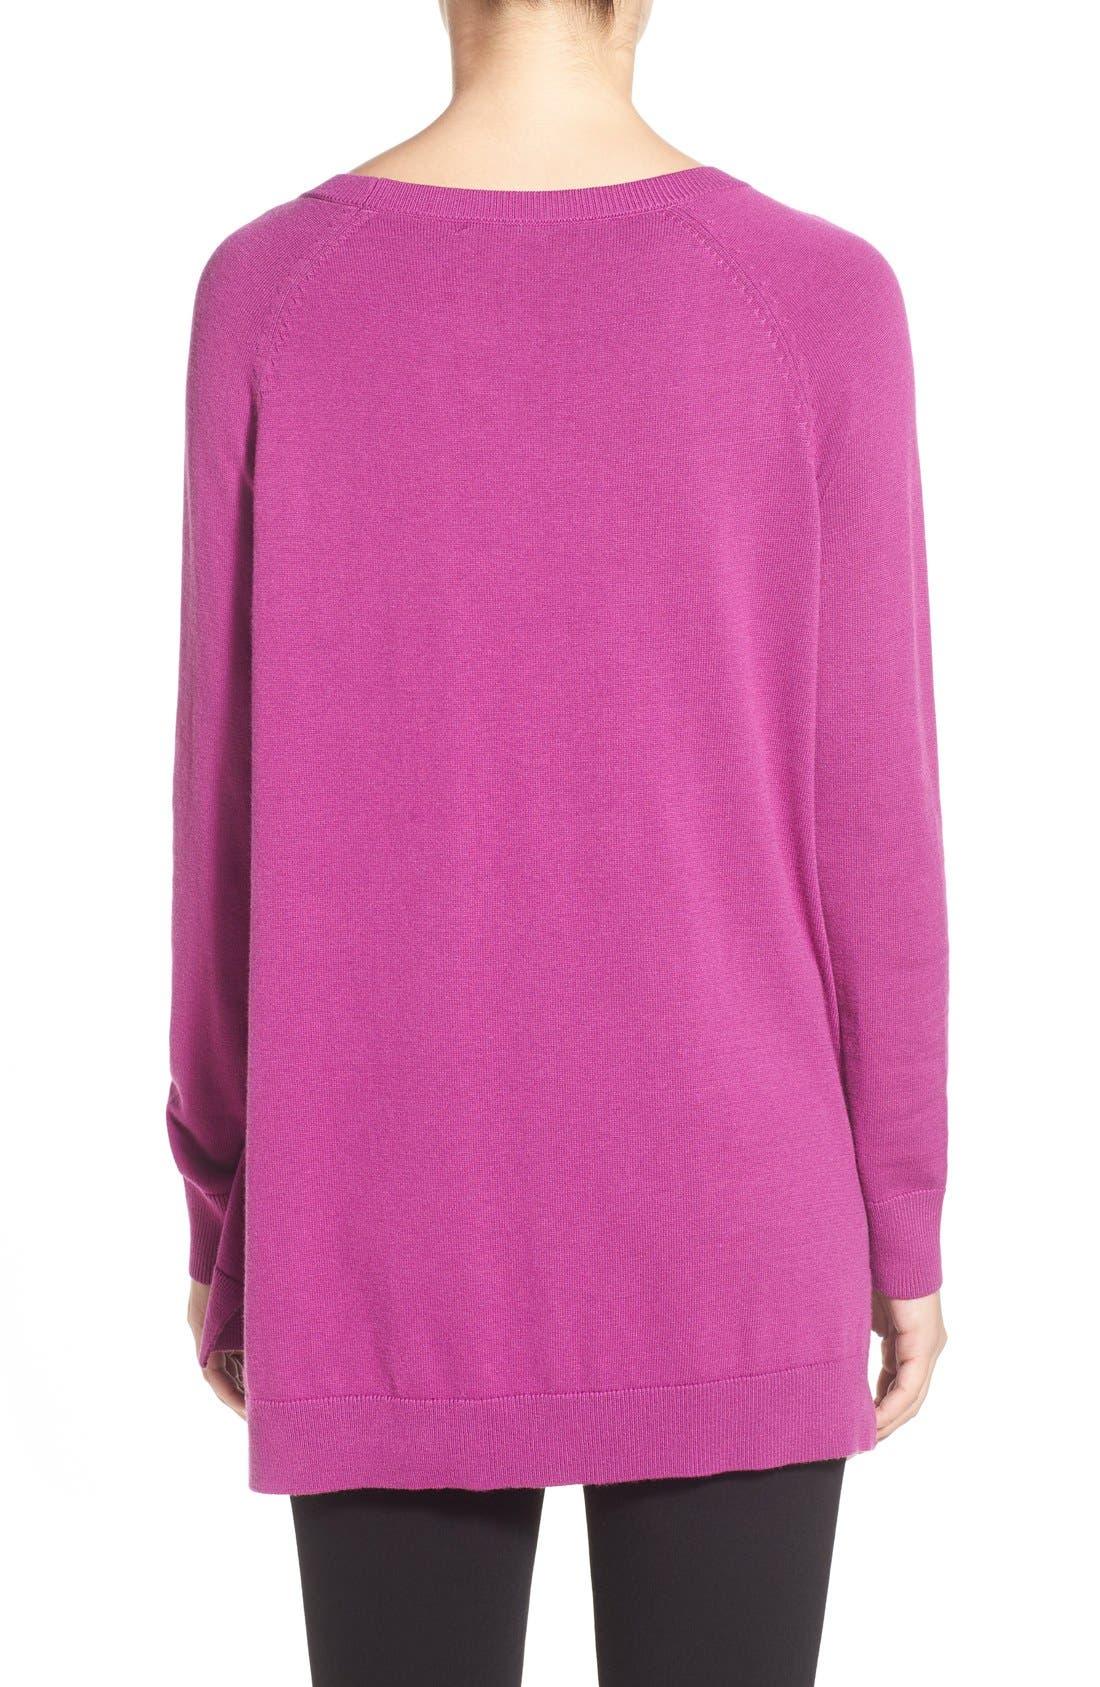 Raglan Crewneck Sweater,                             Alternate thumbnail 5, color,                             510